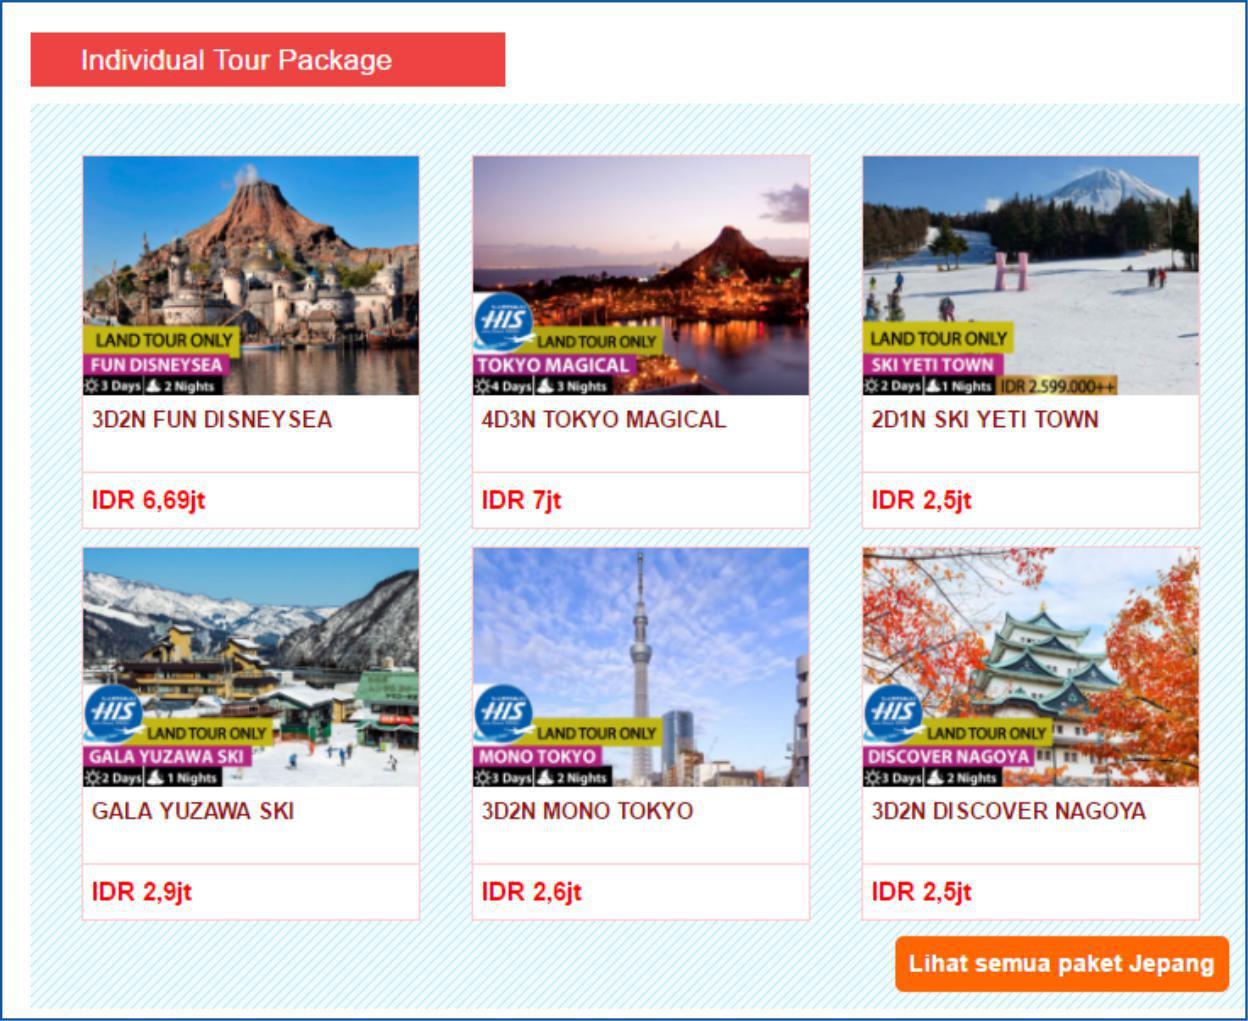 Alasan Yang Membuat Jepang Begitu Luarbiasa Khairulleon Com Travel Blogger